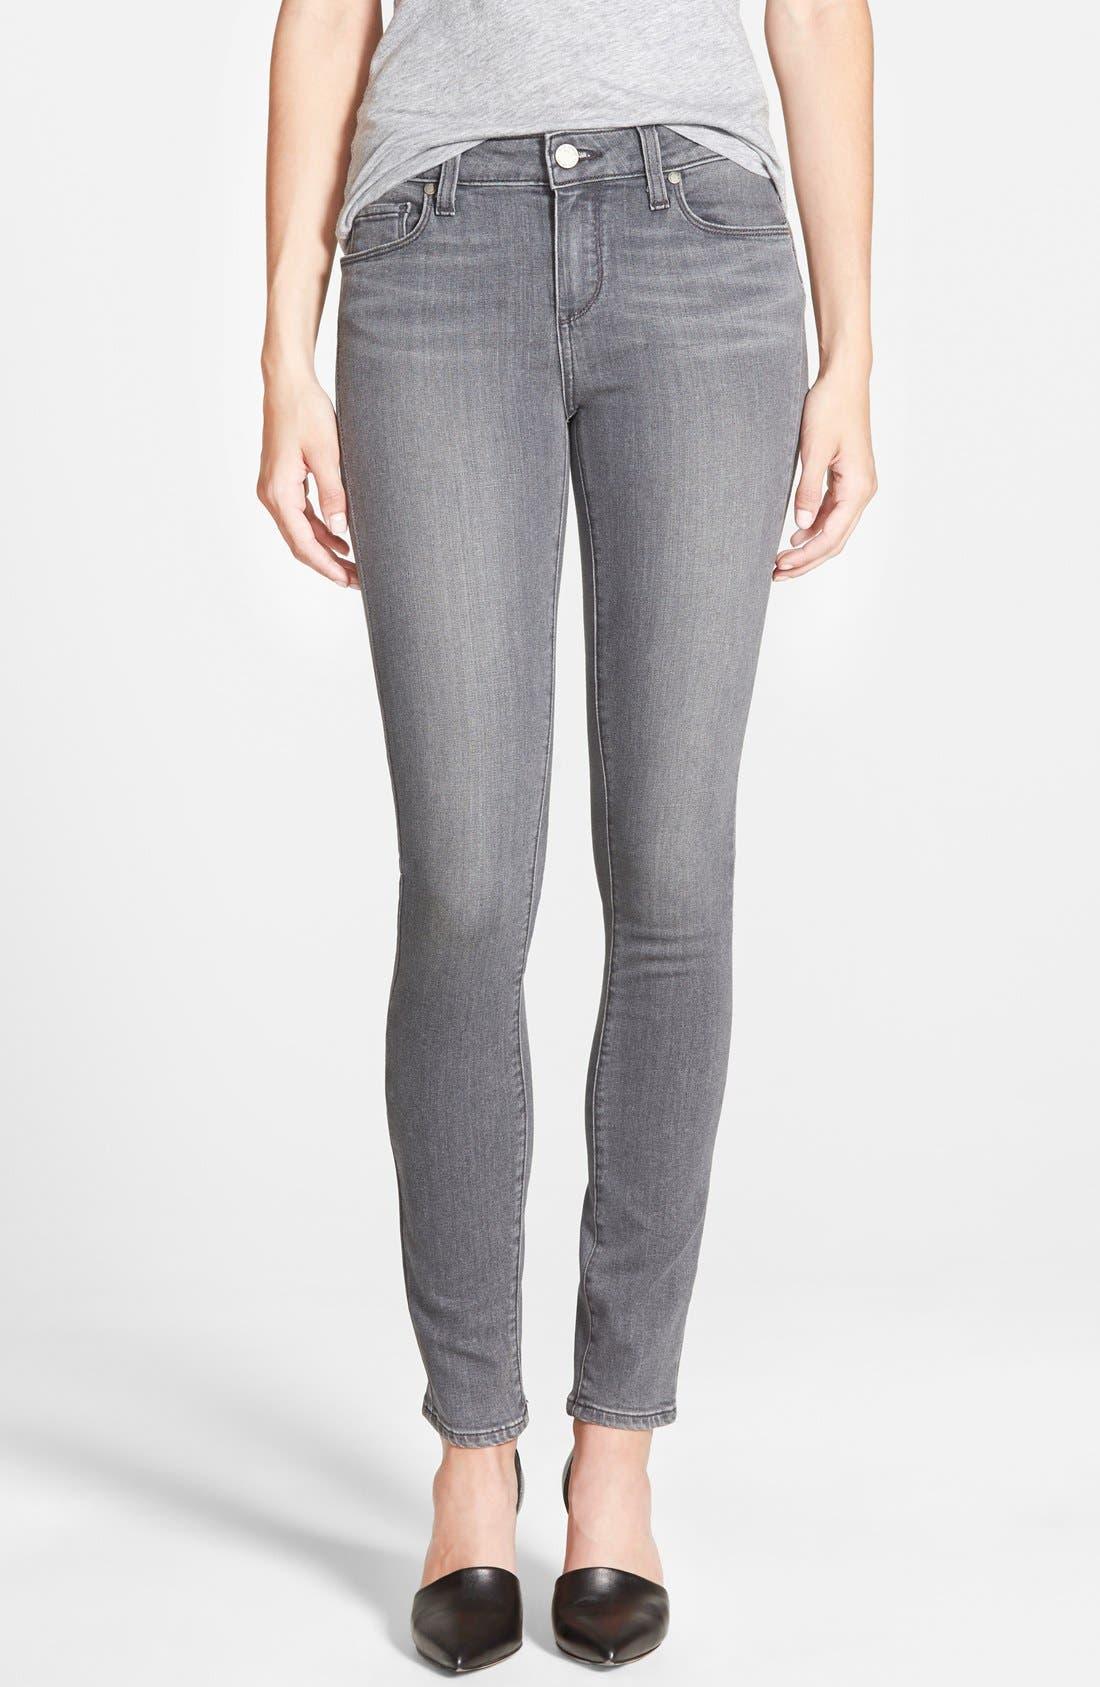 Transcend - Verdugo Ultra Skinny Jeans,                         Main,                         color, SILVIE